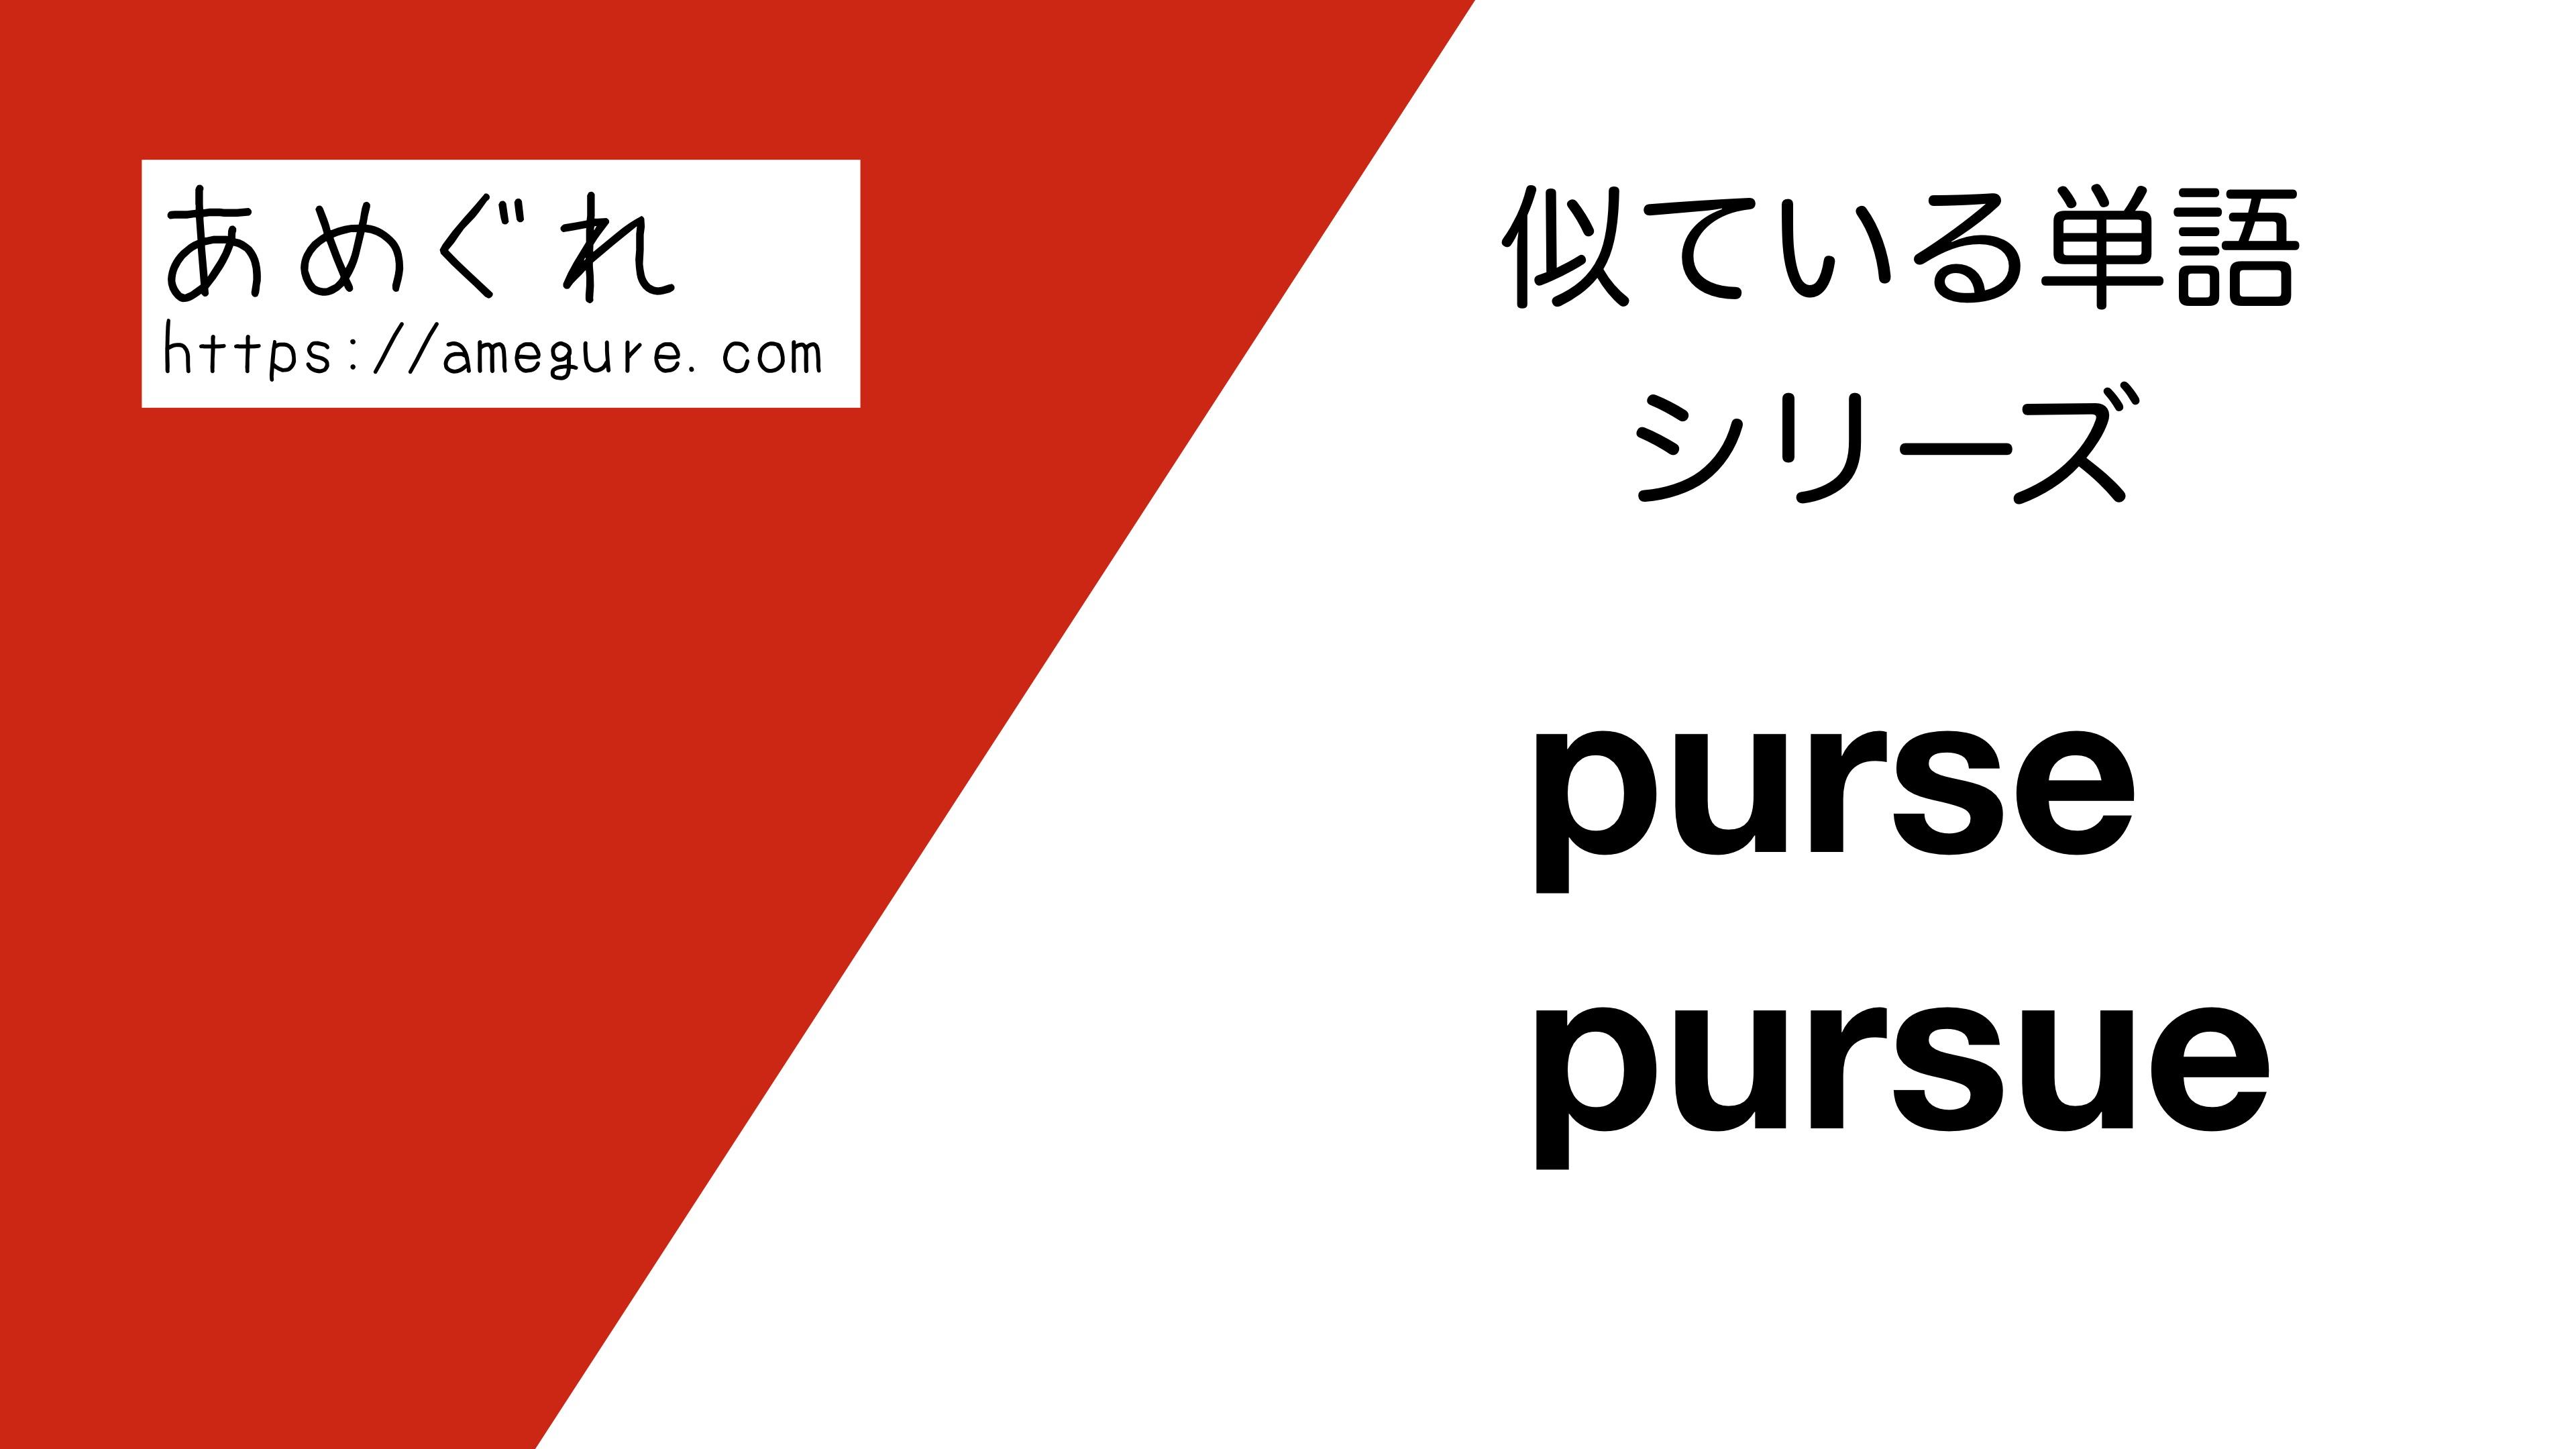 purse-pursue違い